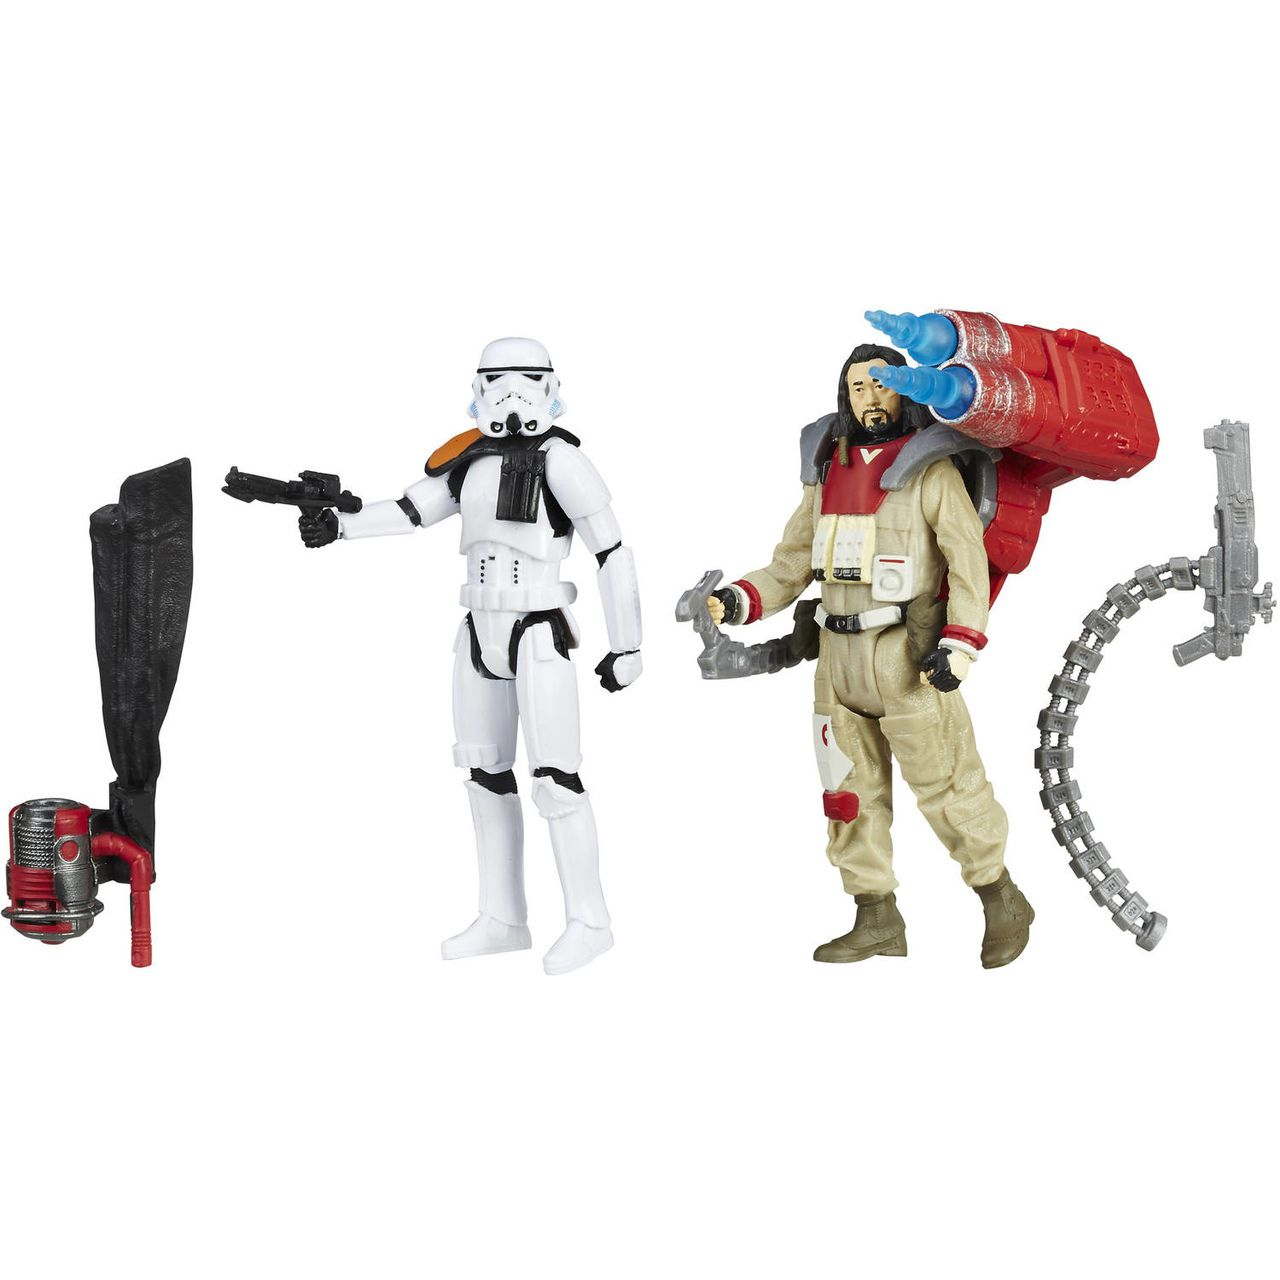 Action Figure Baze Malbus vs. Imperial Stormtrooper: Star Wars Rogue One - Boneco Colecionável - Hasbro